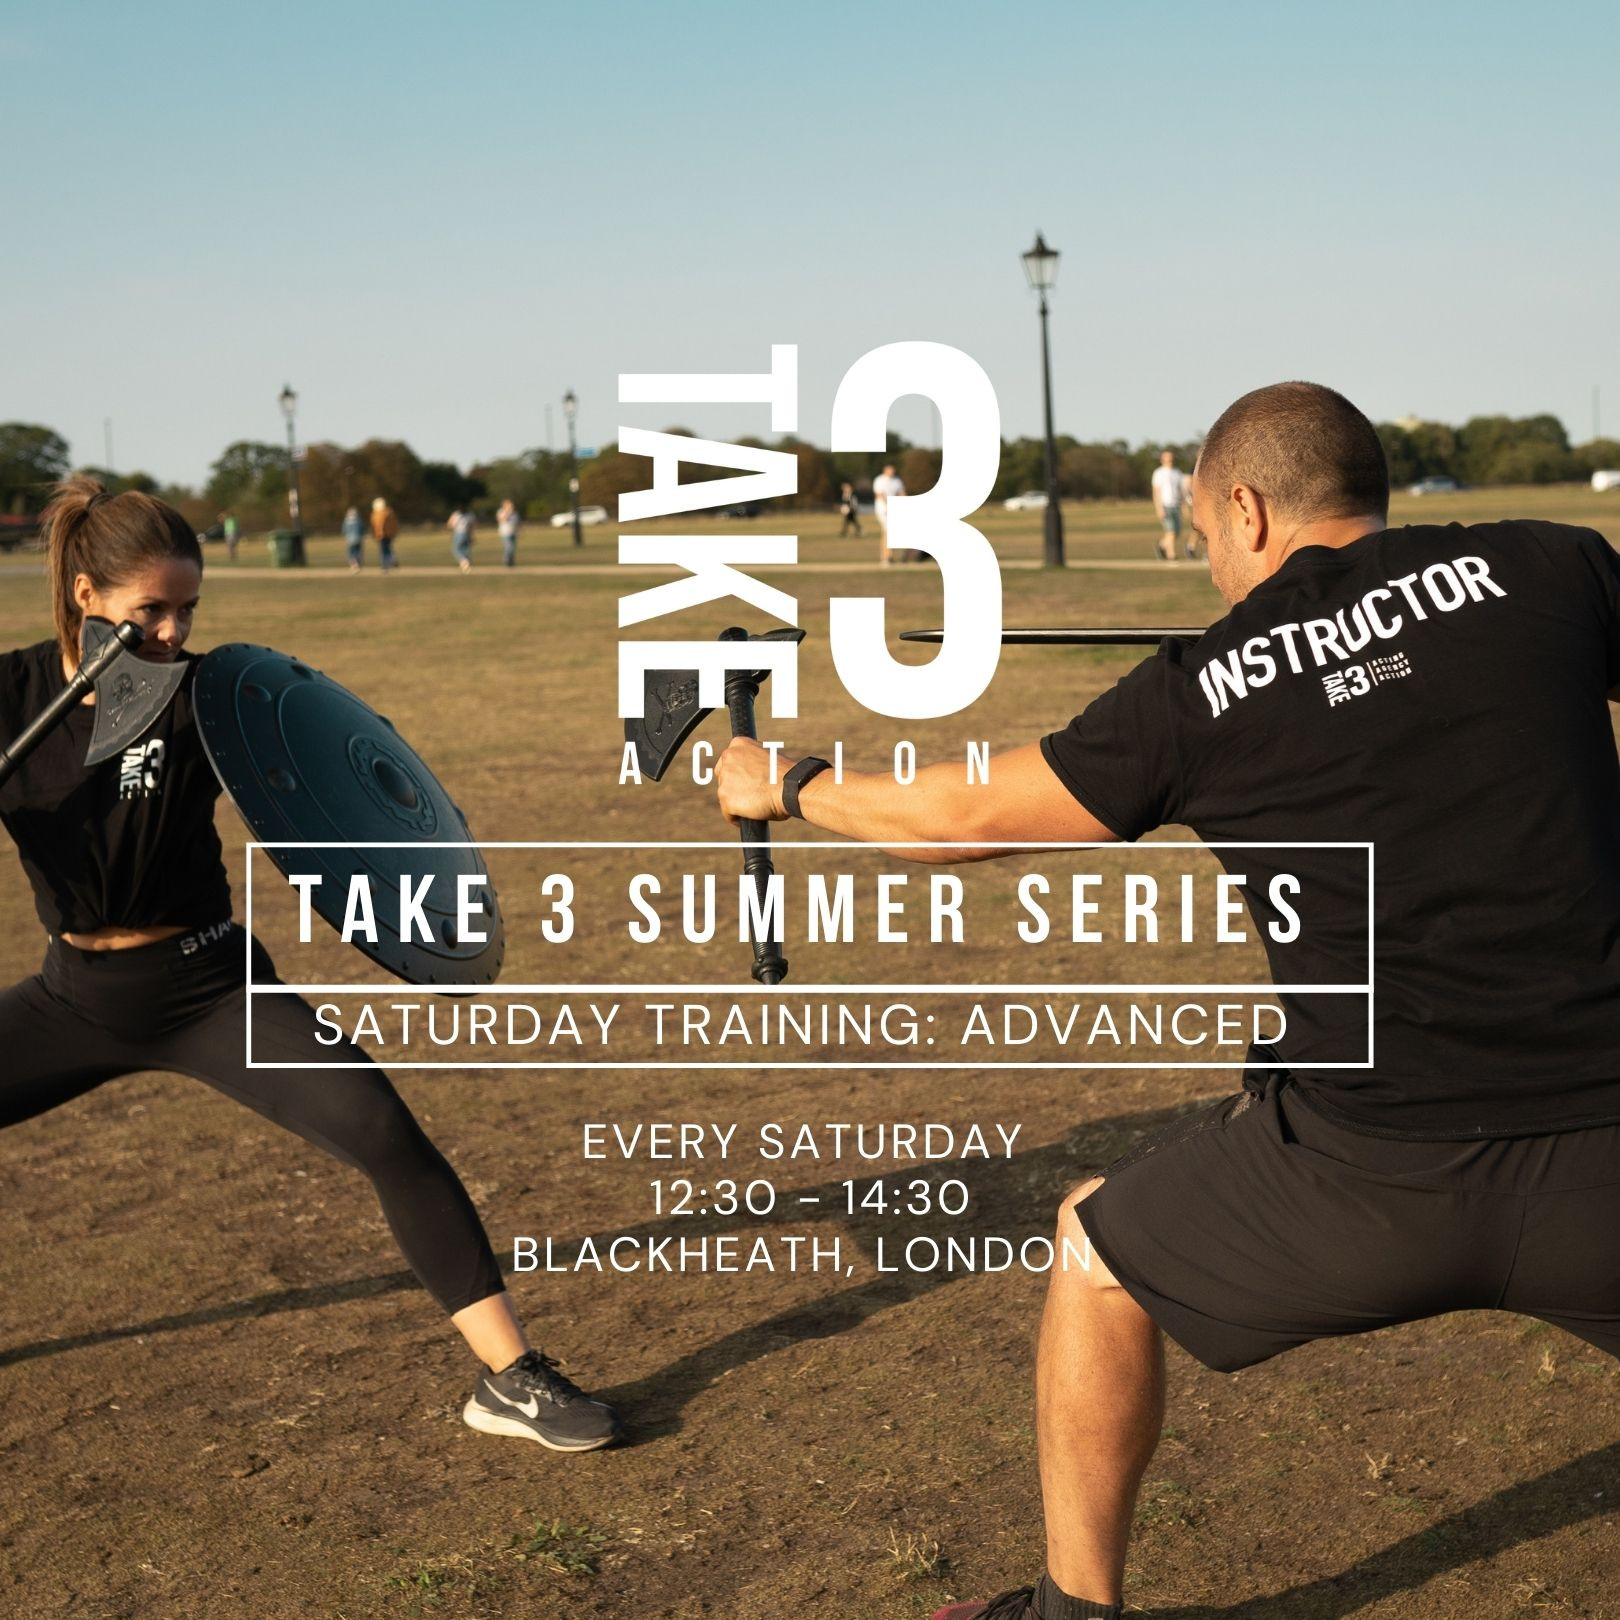 Saturday Training: Advanced